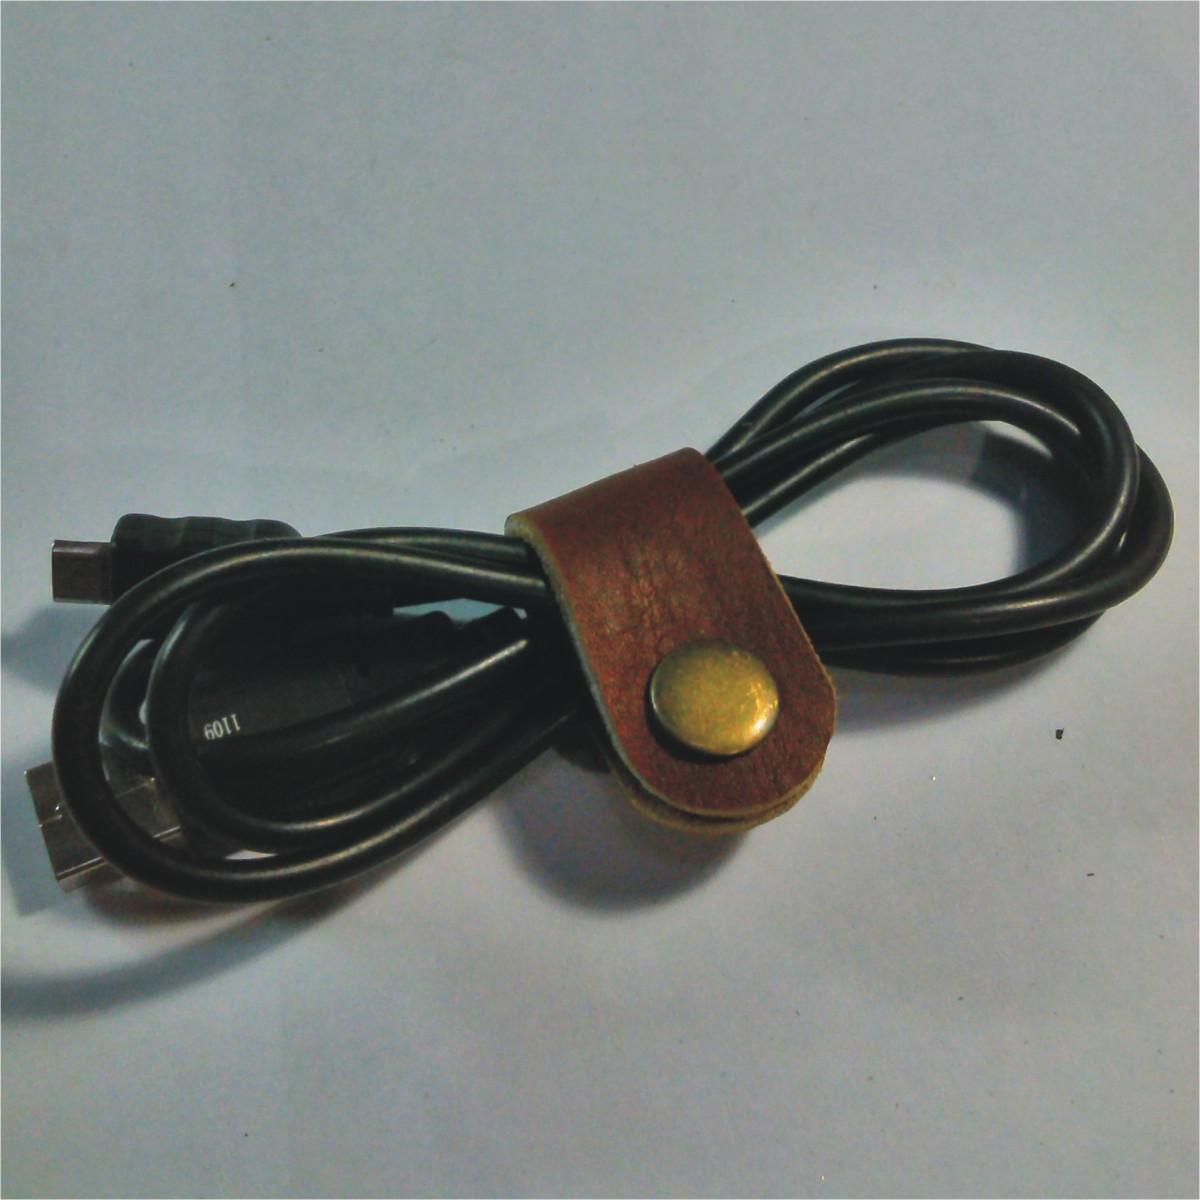 Jual Produk Ukm Klip Kabel Kulit Asli Leather Cable Clips Penjepit Earphone Clip Headset Blanja